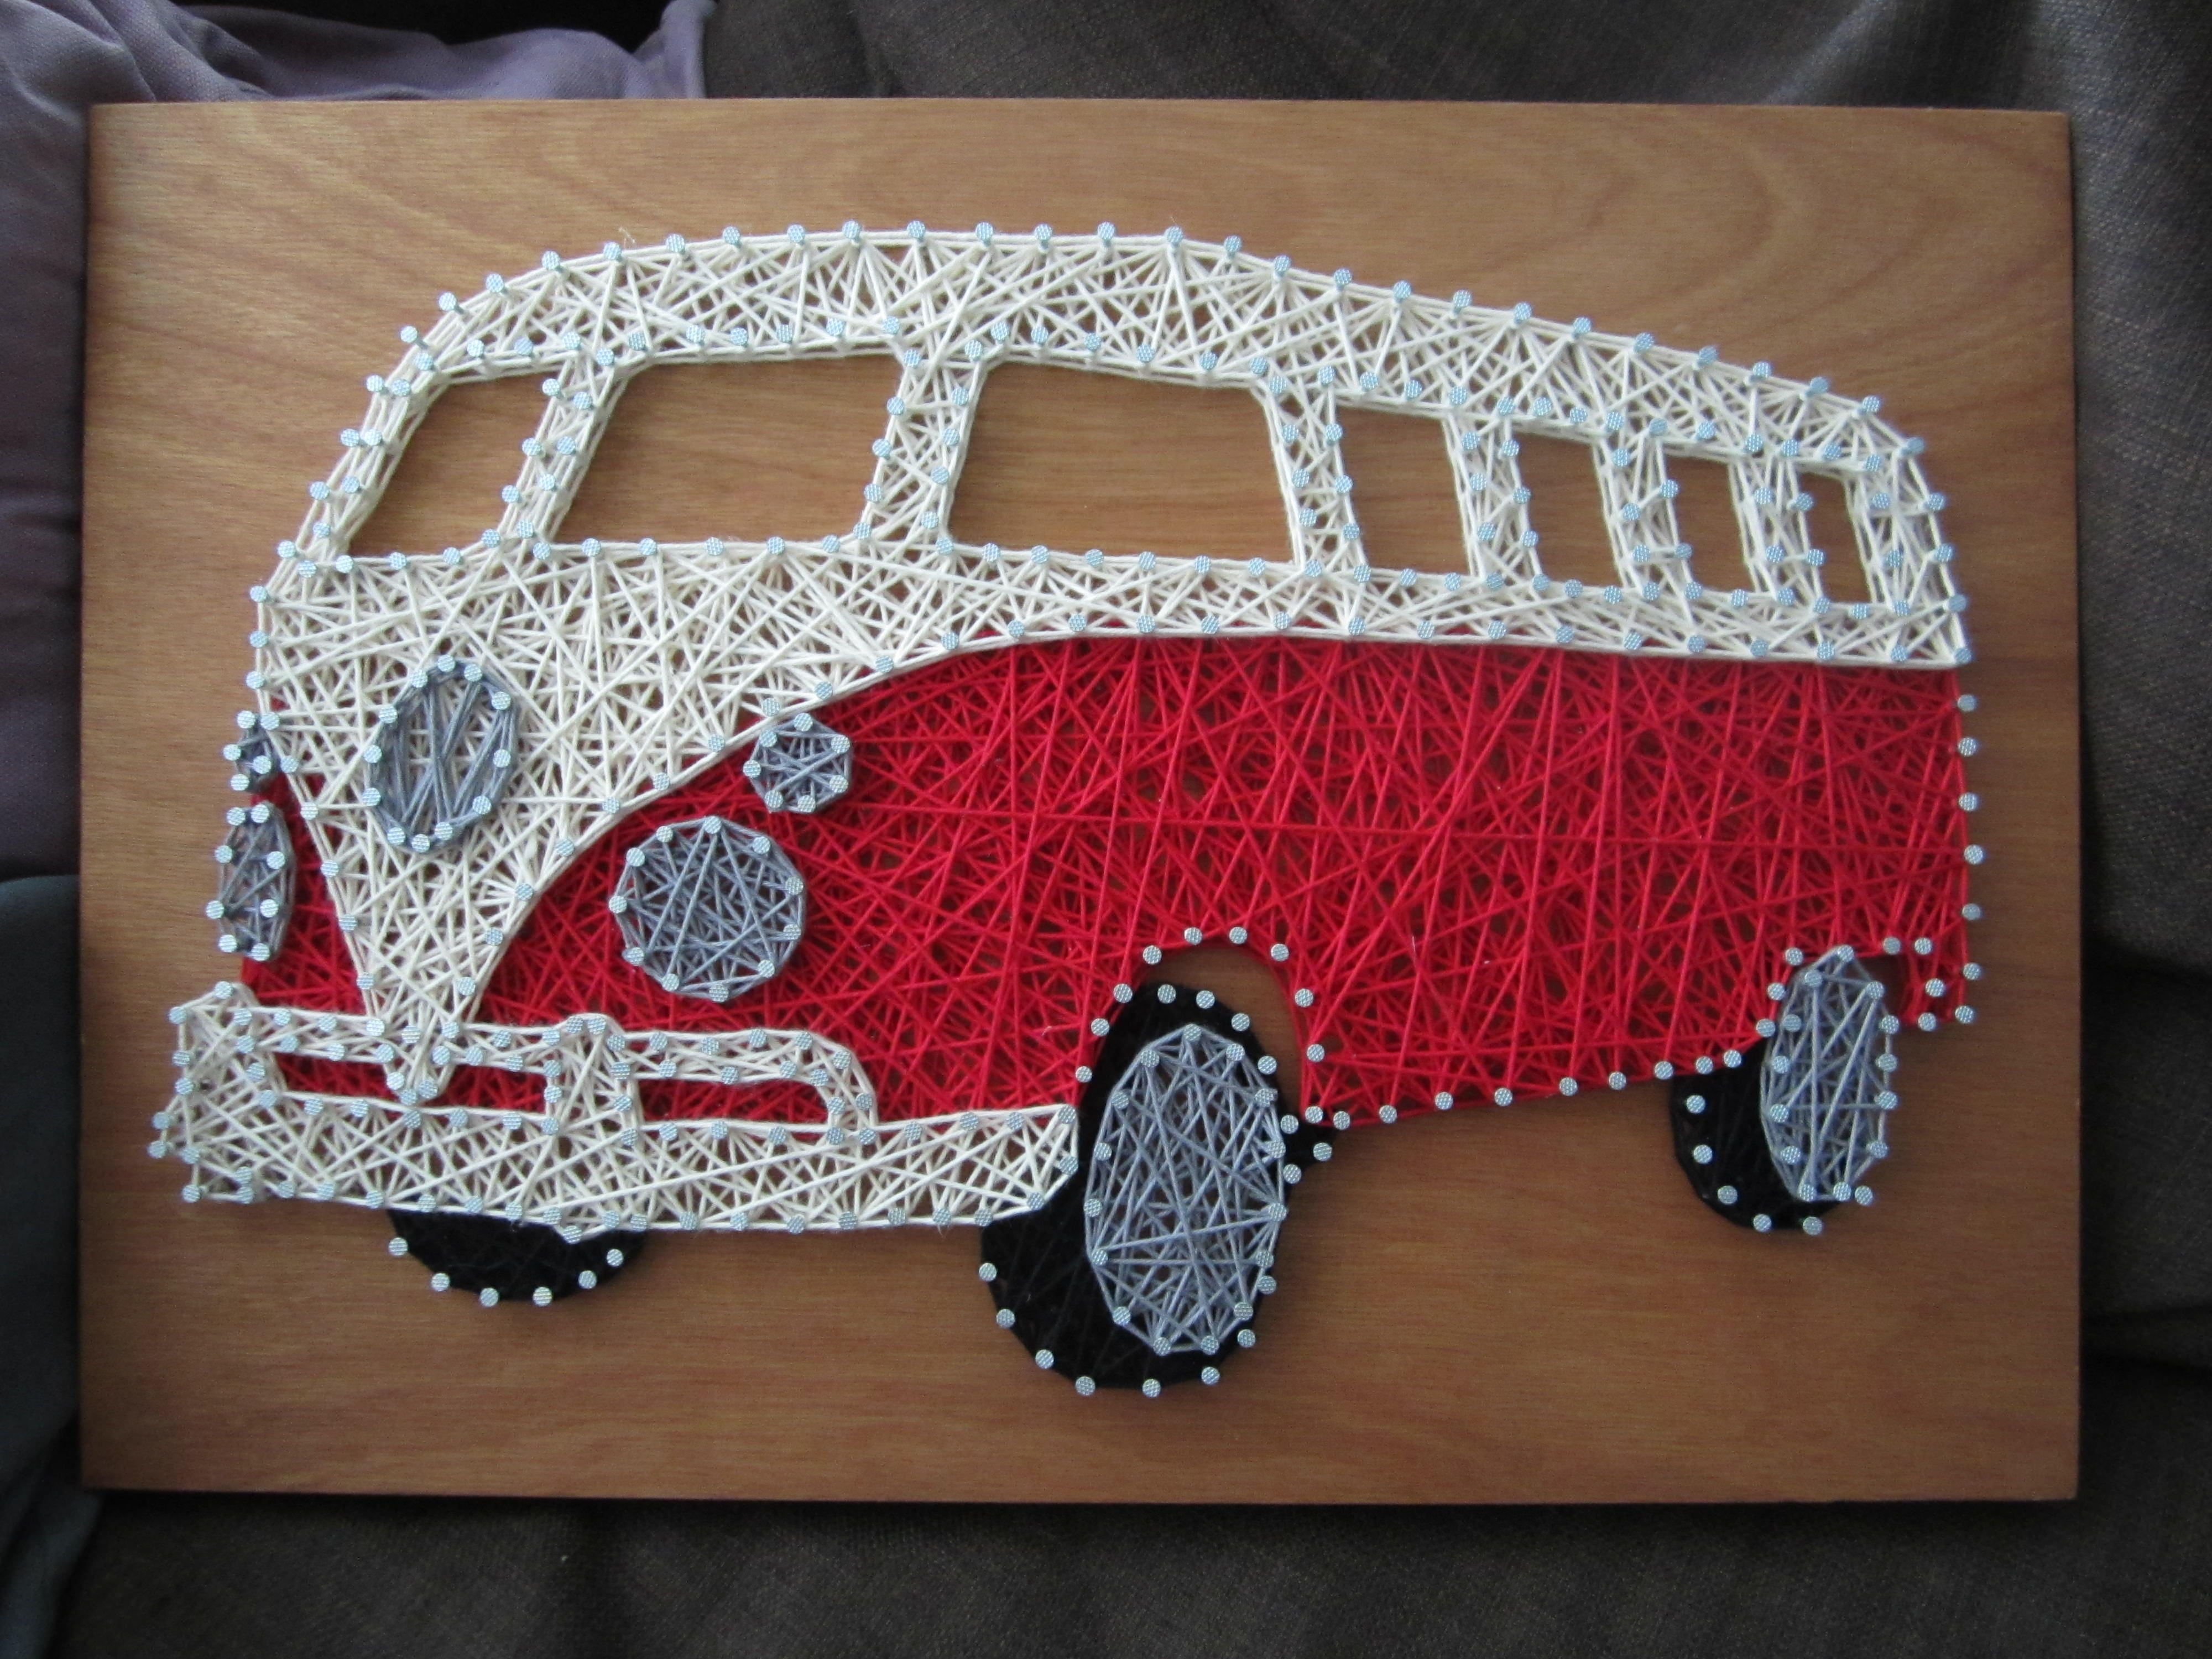 VW Van String Art #handmade #crafts #HowTo #DIY